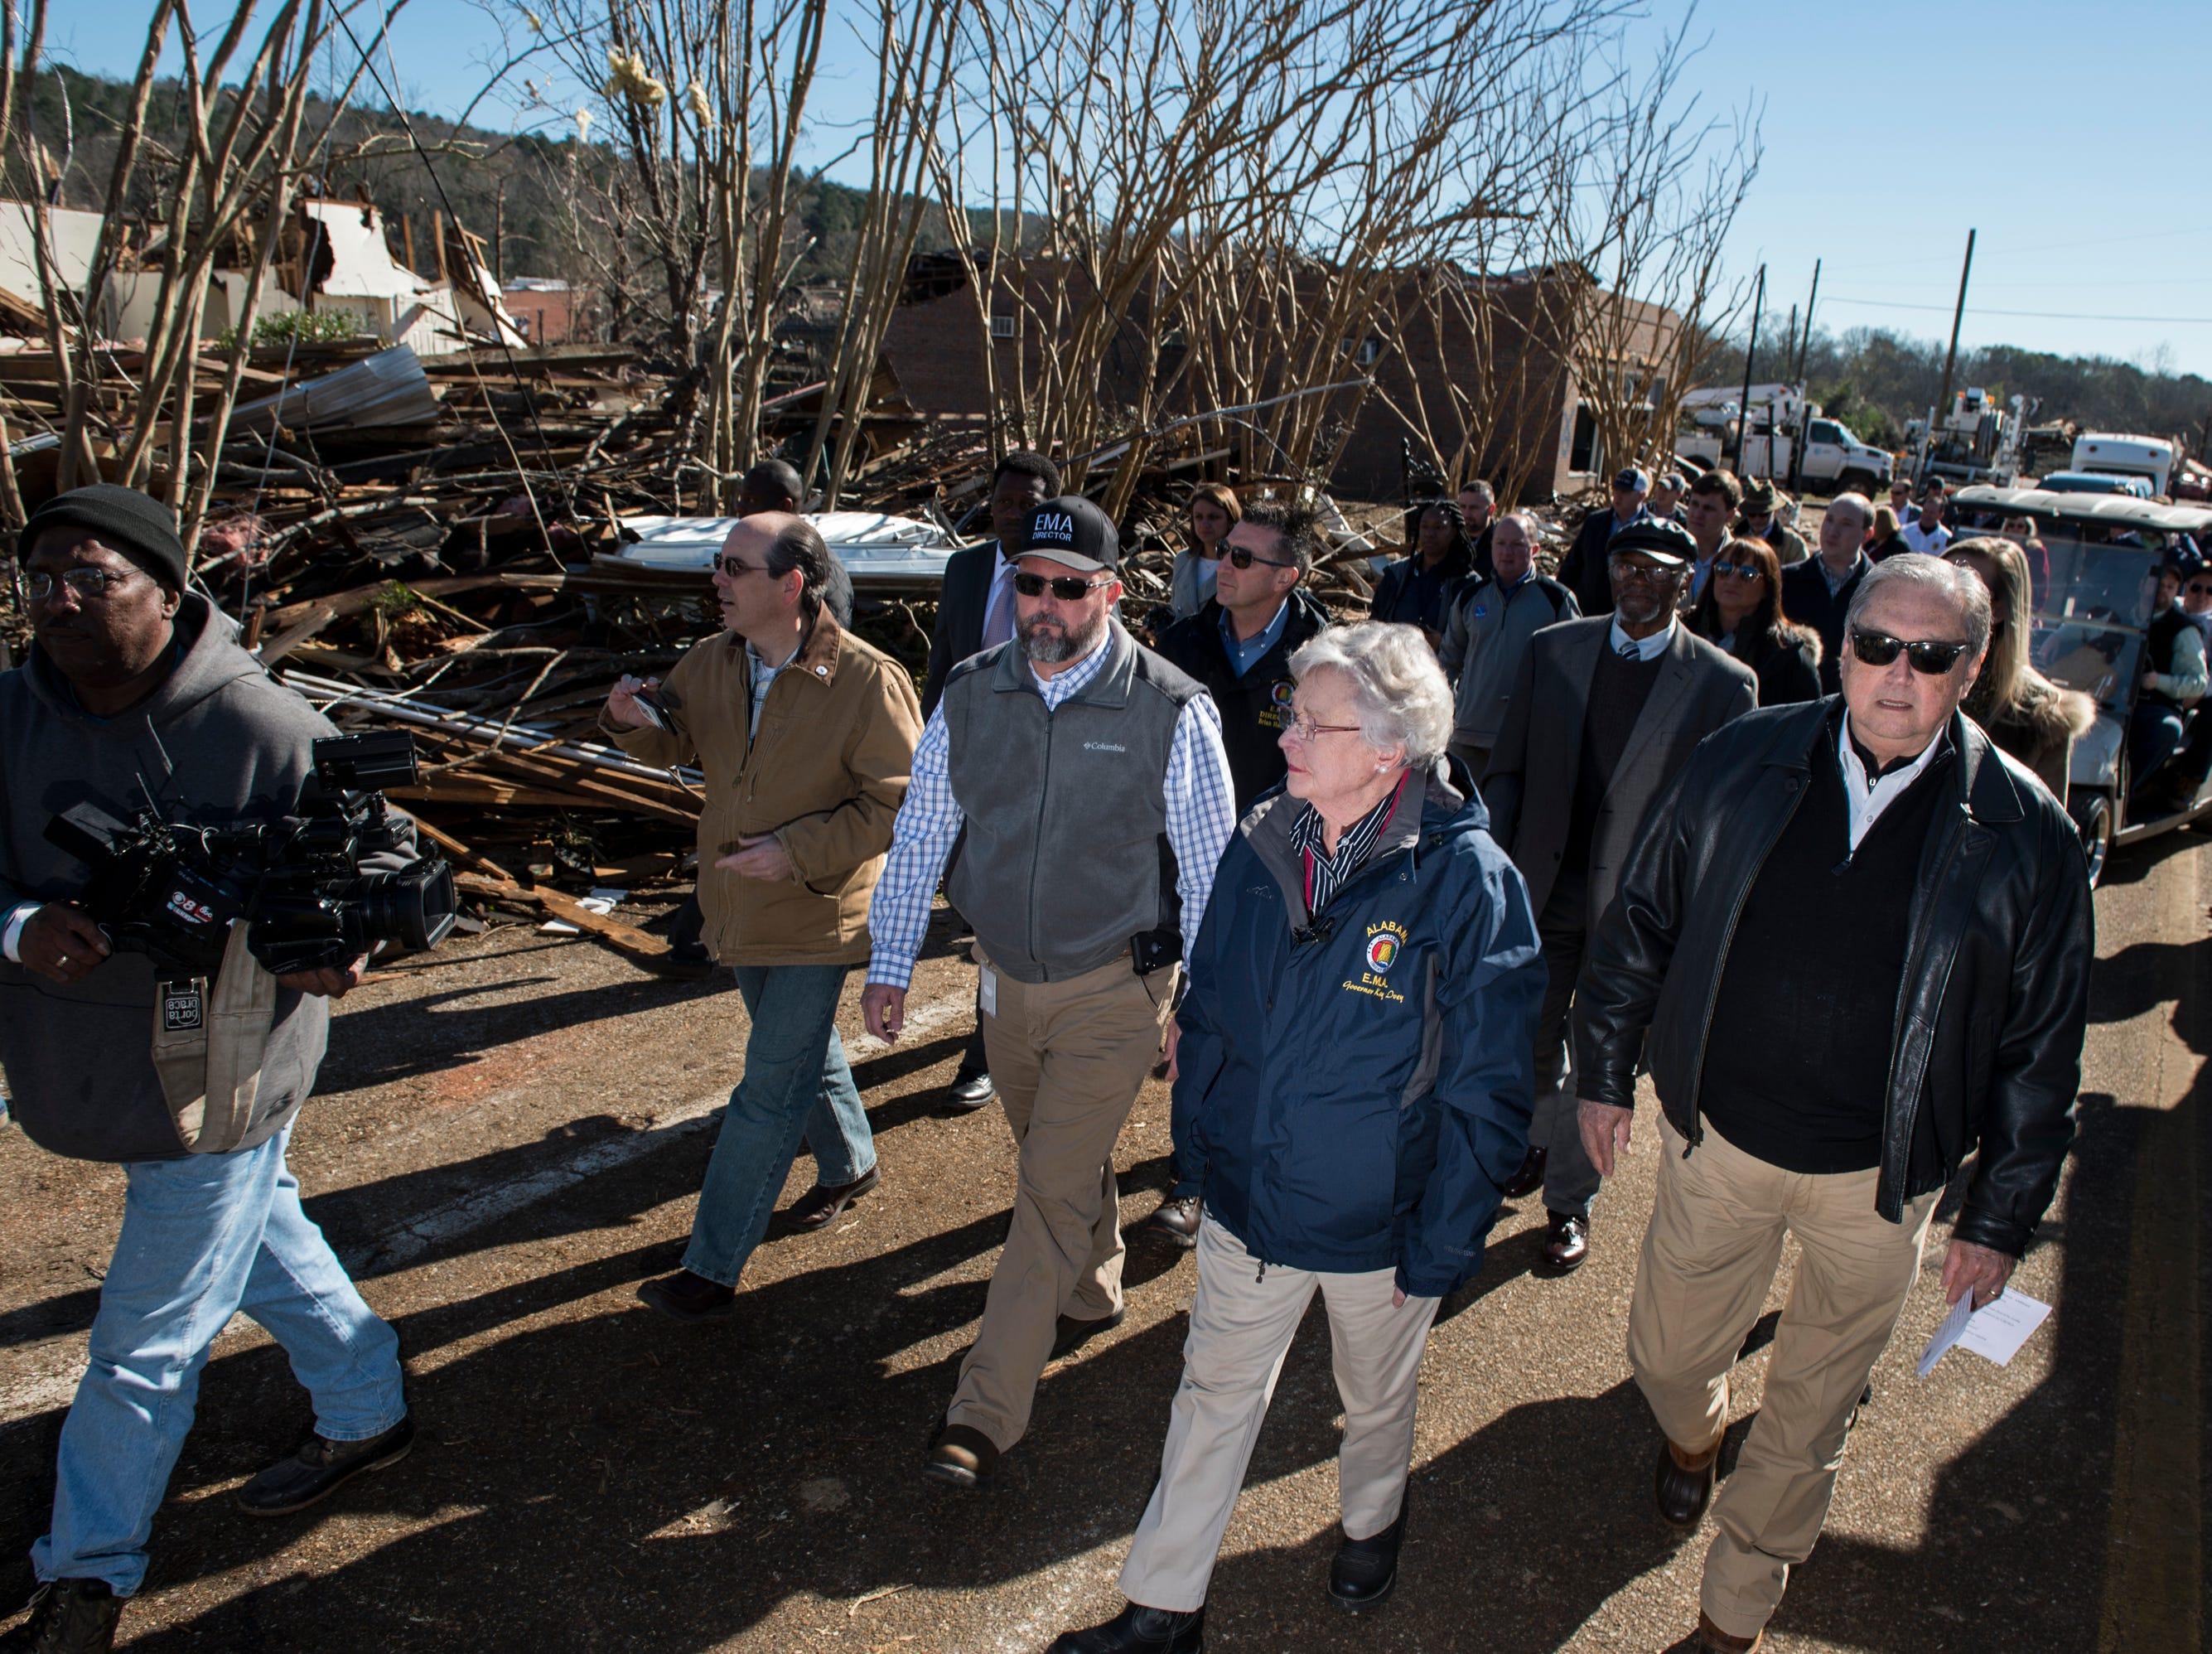 Gov. Kay Ivey and Wetumpka Mayor Jerry Willis survey tornado damage in Wetumpka, Ala., on Monday, Jan. 21, 2019.